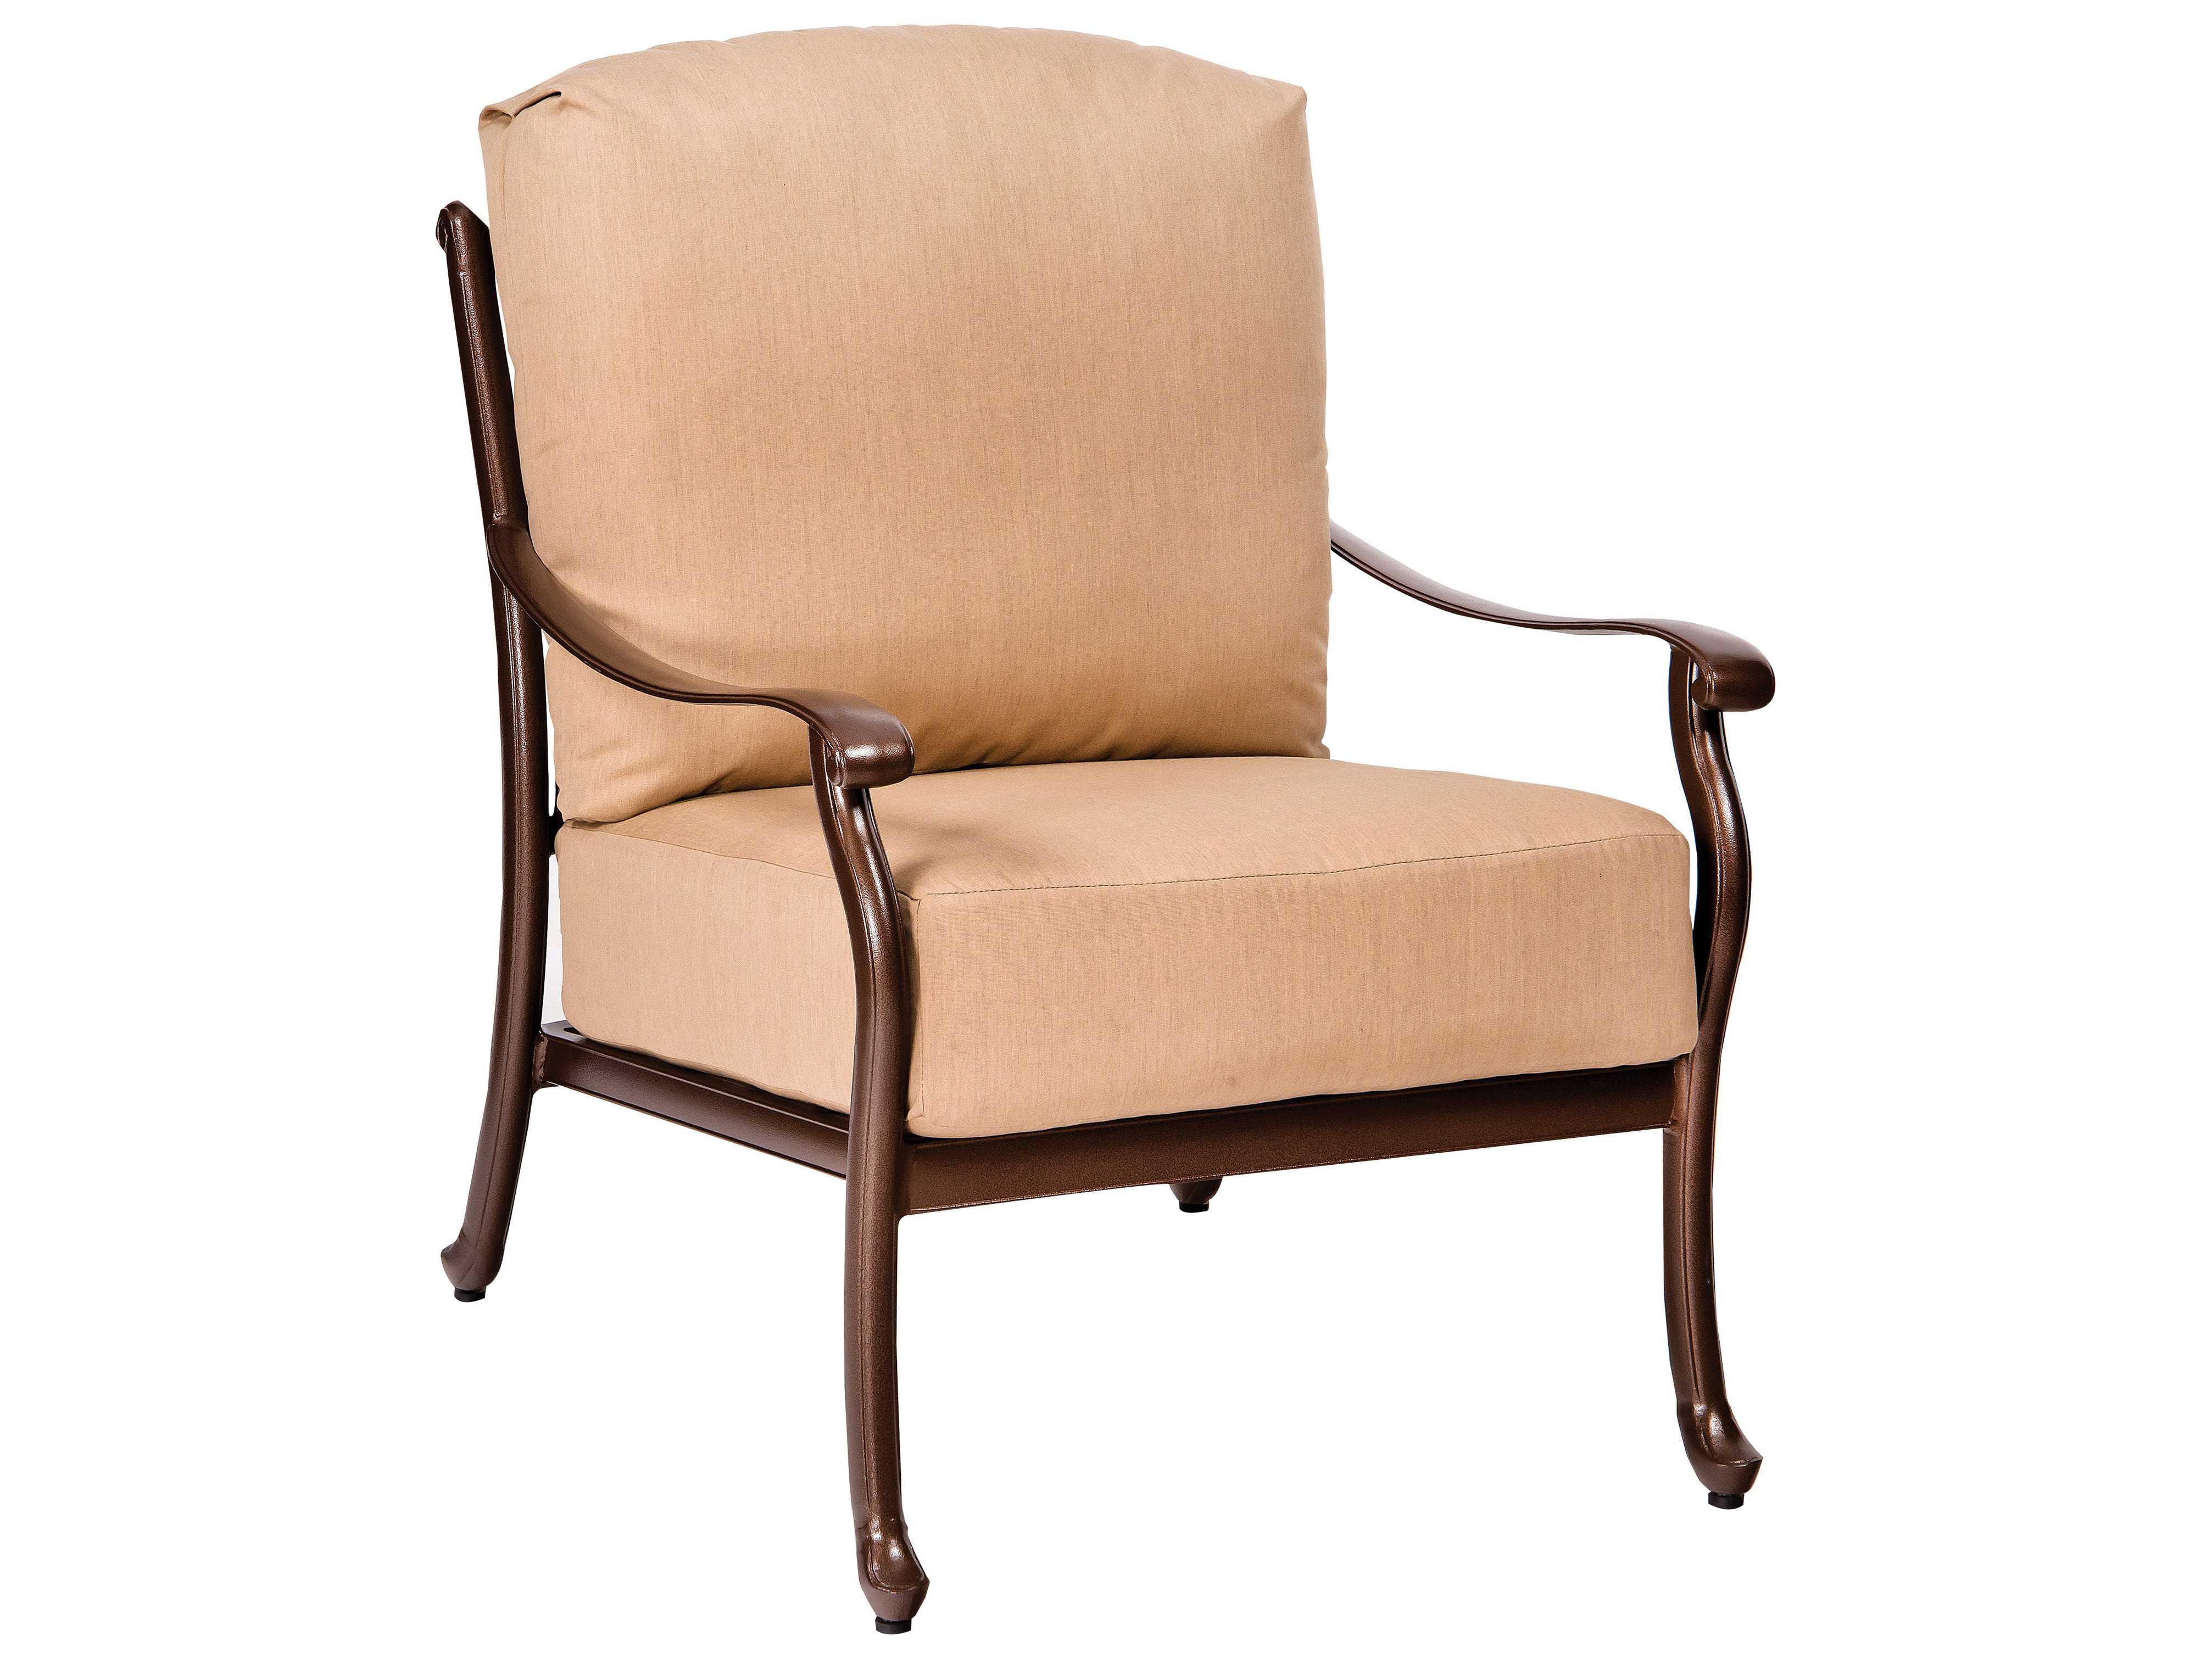 aluminum lounge chairs best chair pads for hardwood floors woodard casa cast wr3y0406